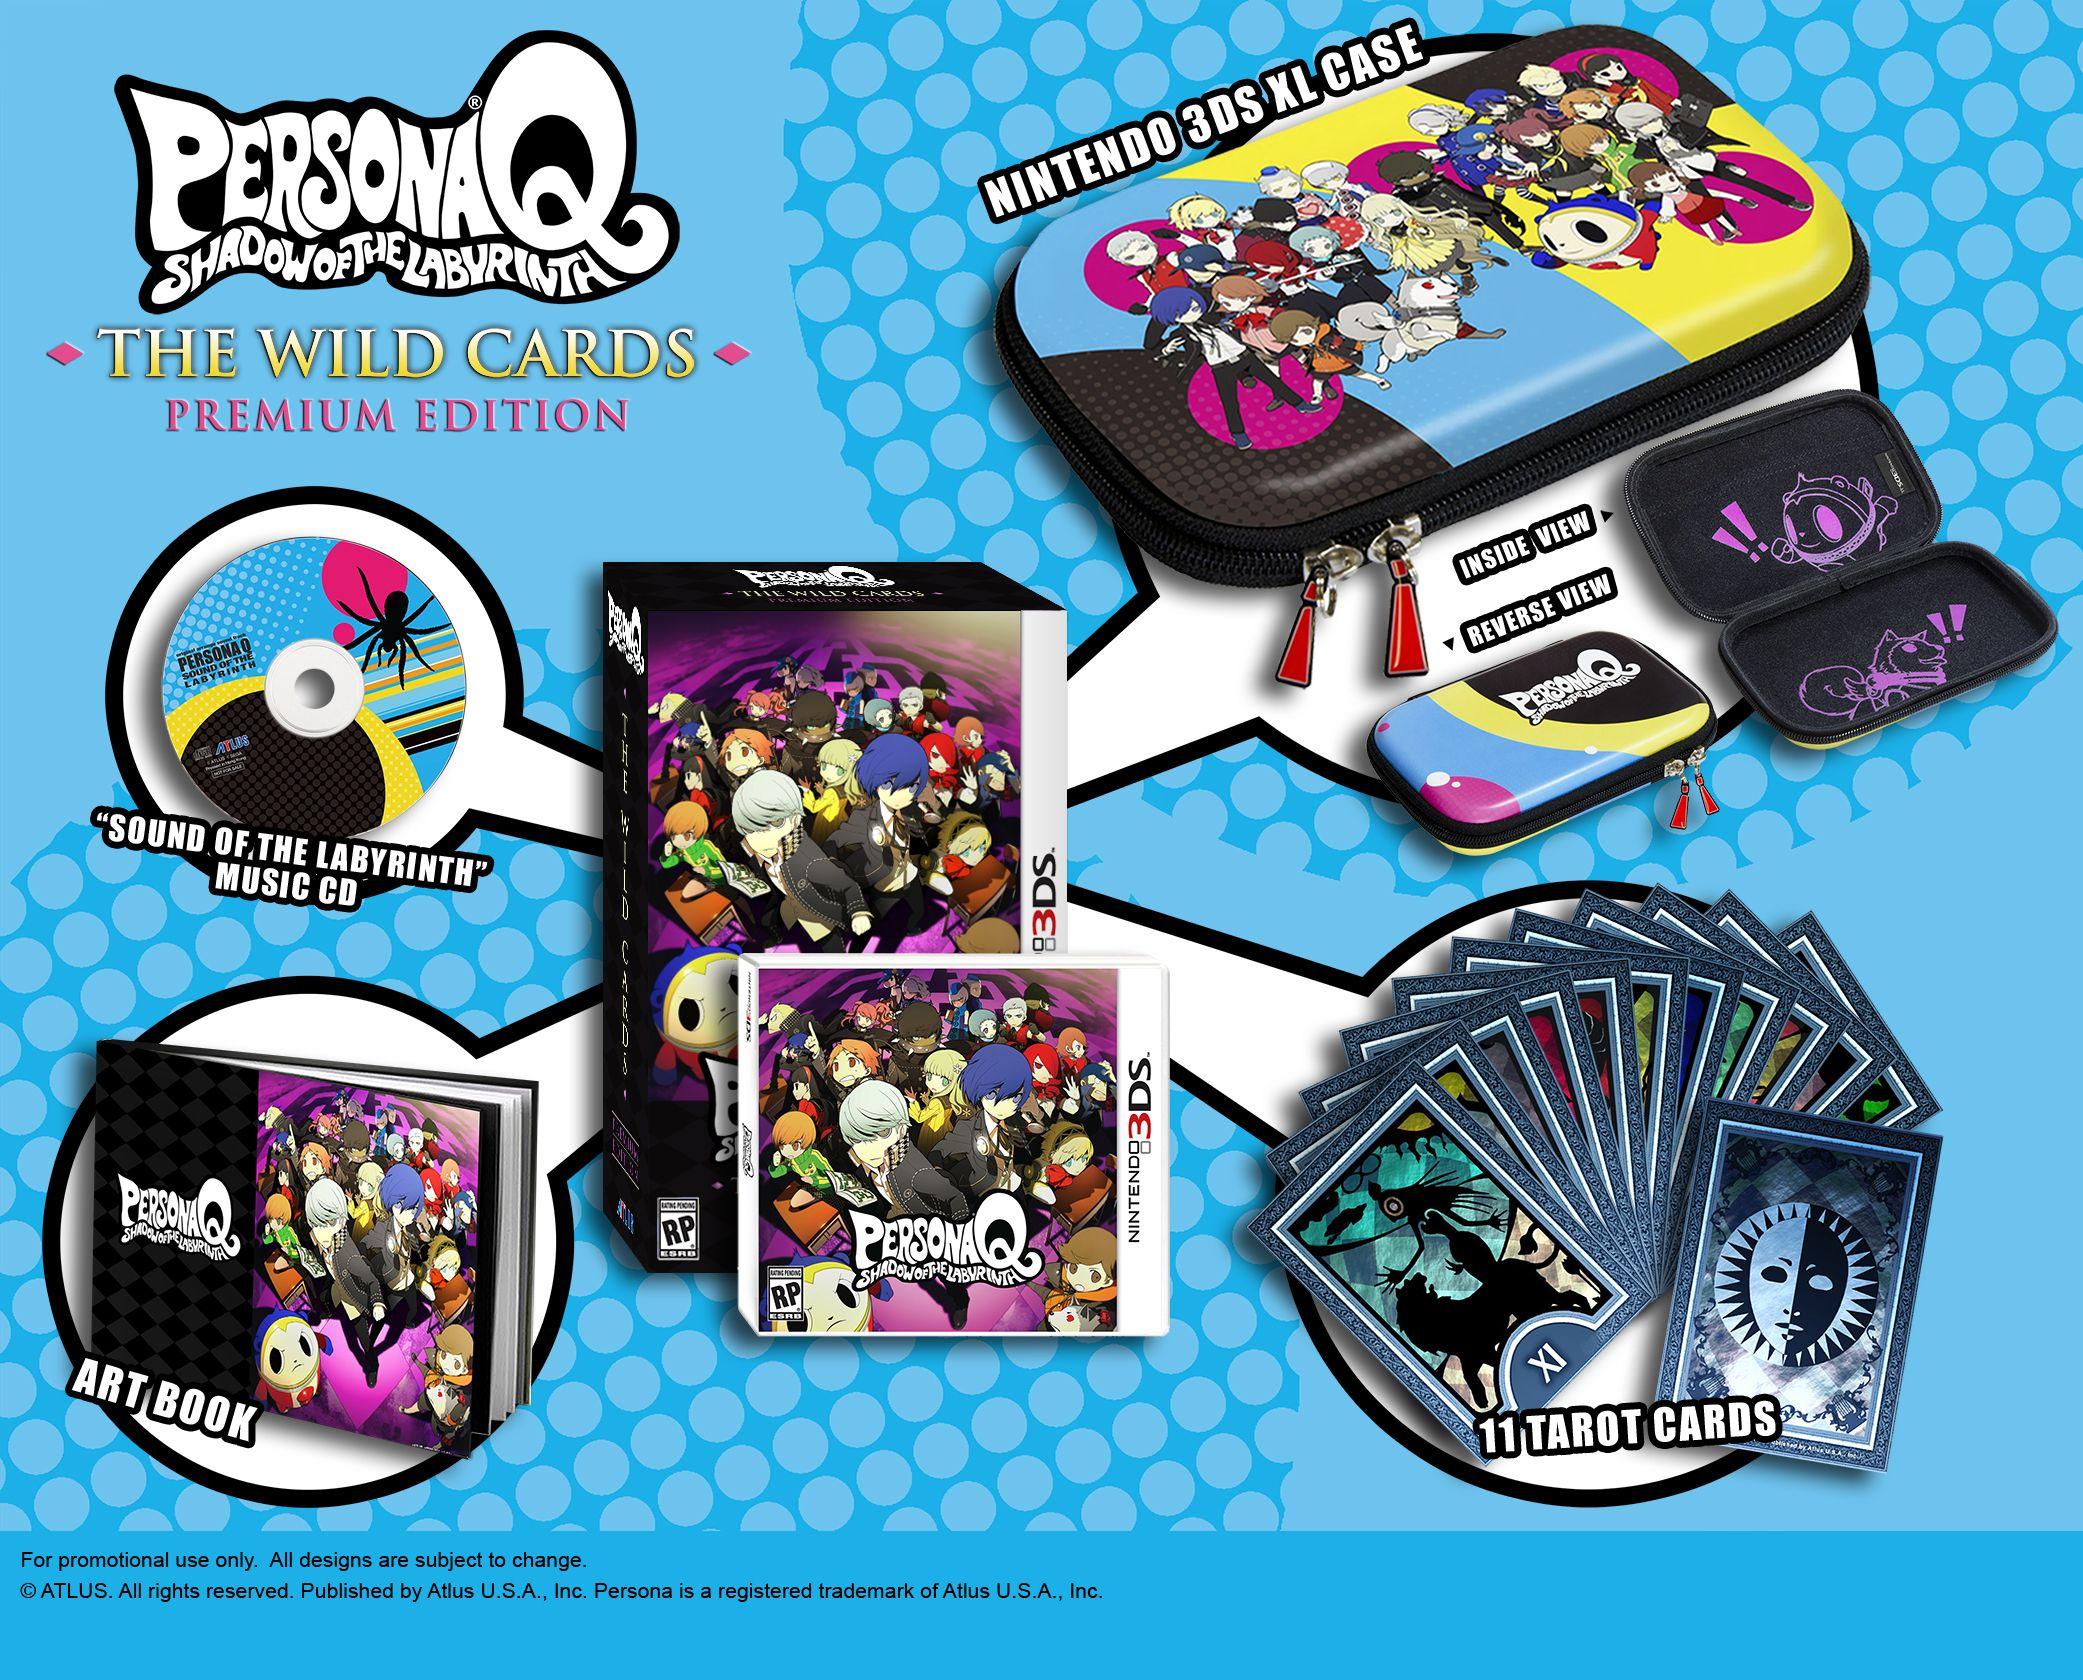 http://gematsu.com/wp-content/uploads/2014/06/PQ-First-Print-Wild-Cards_002.jpg